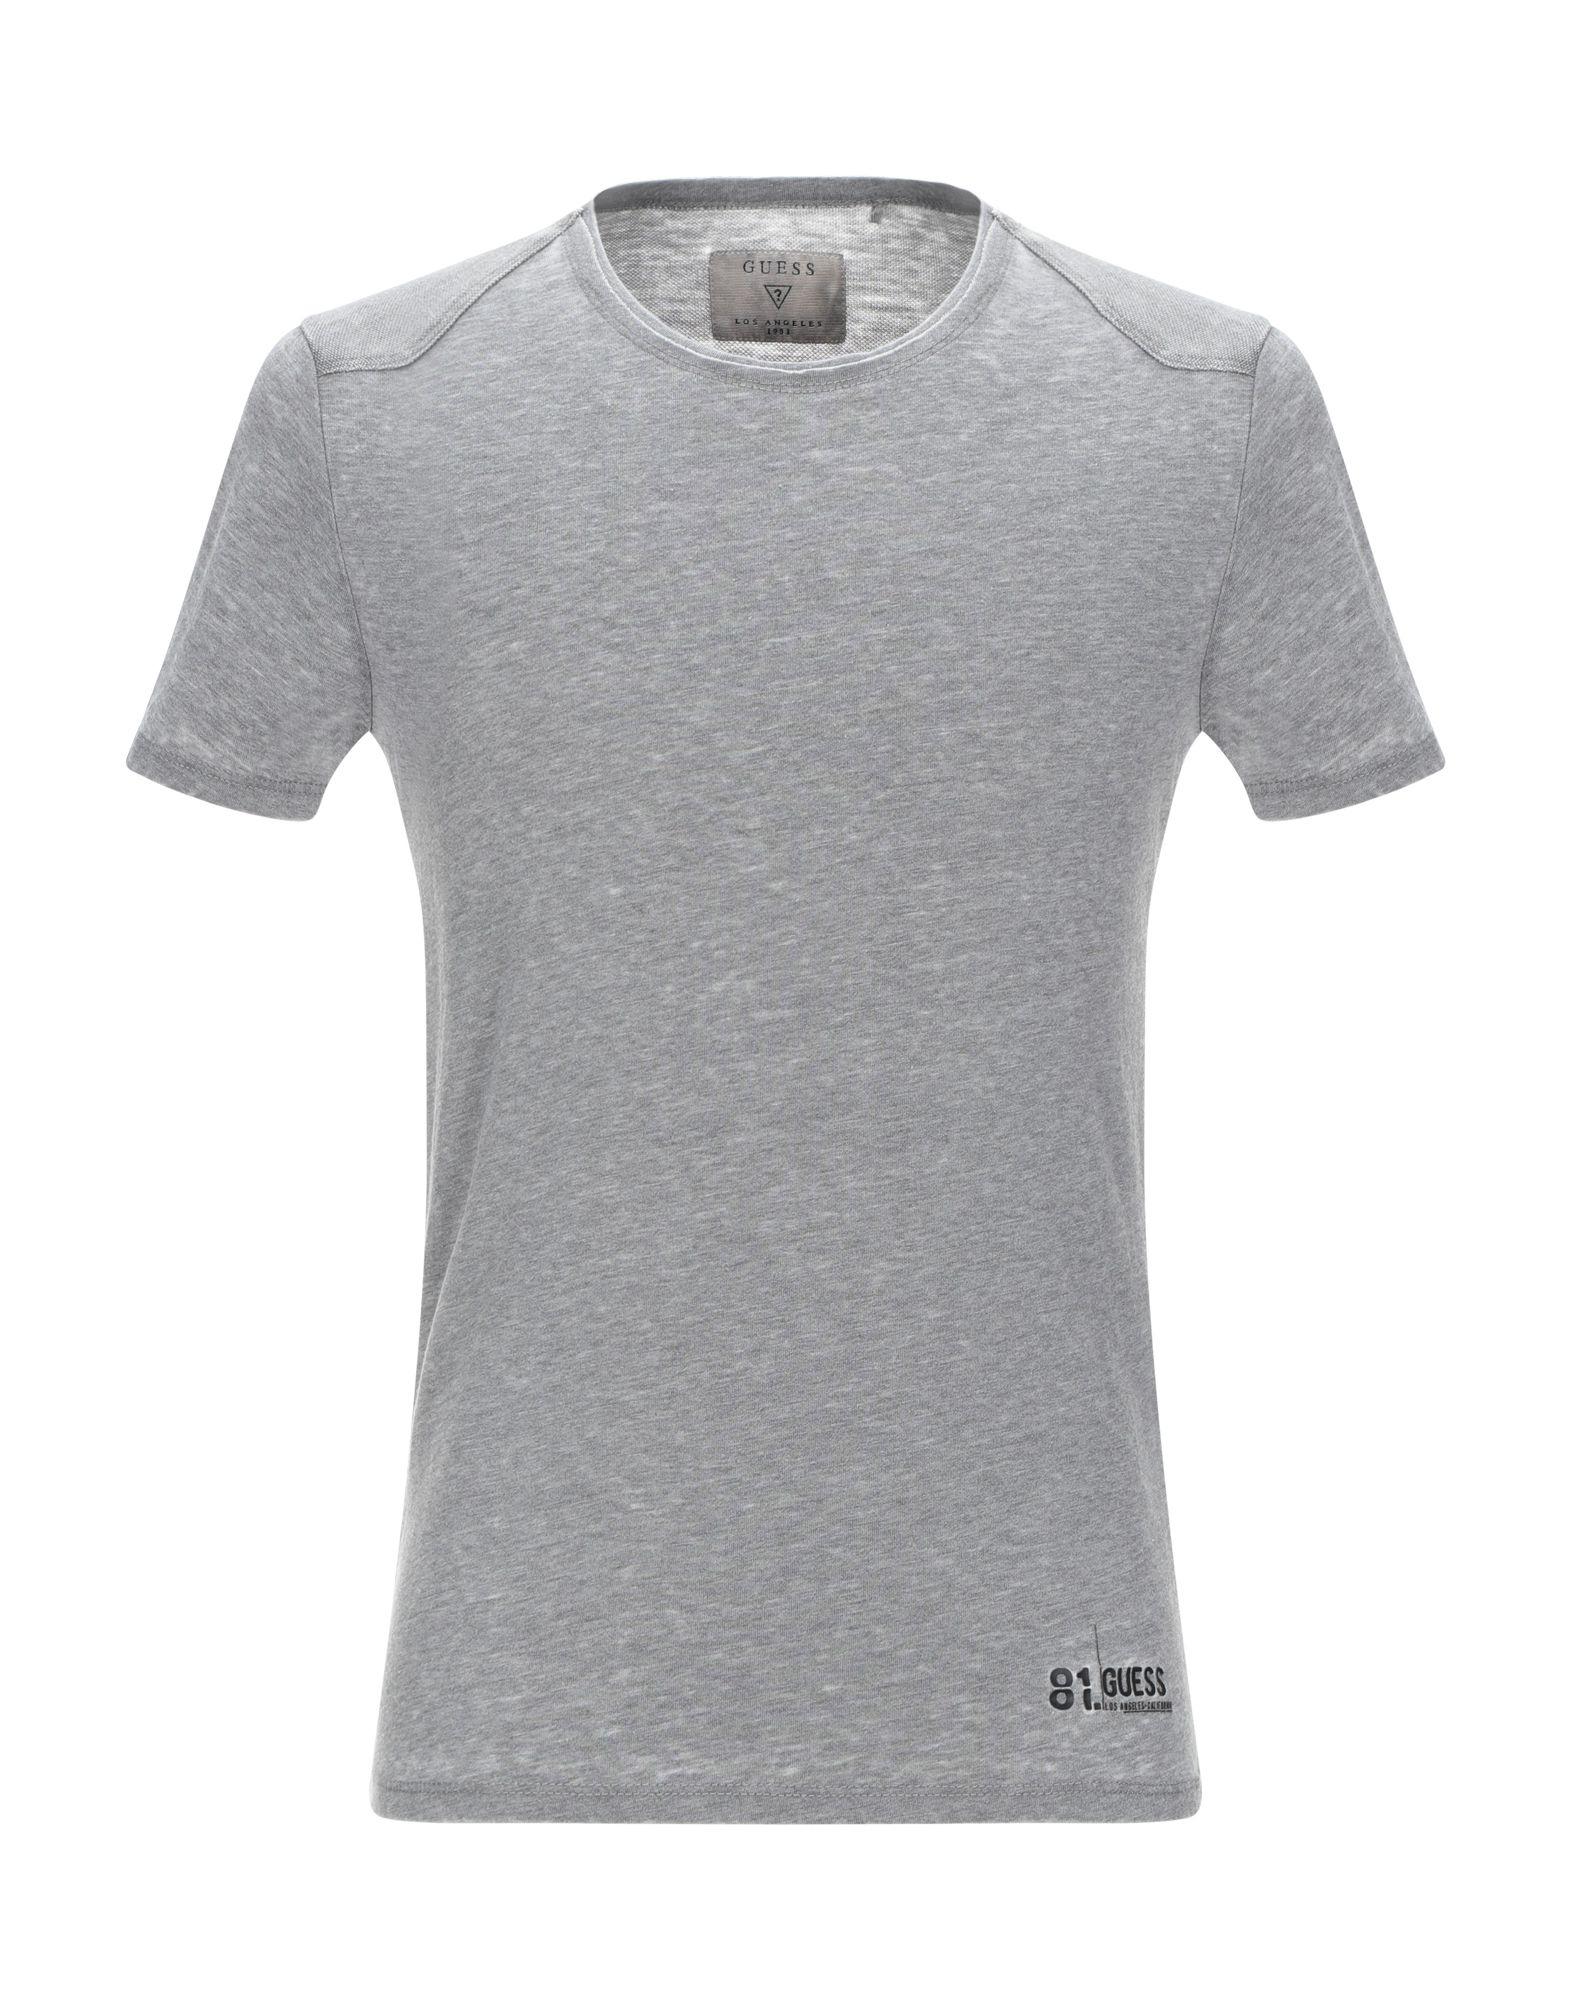 сколько стоит футболка